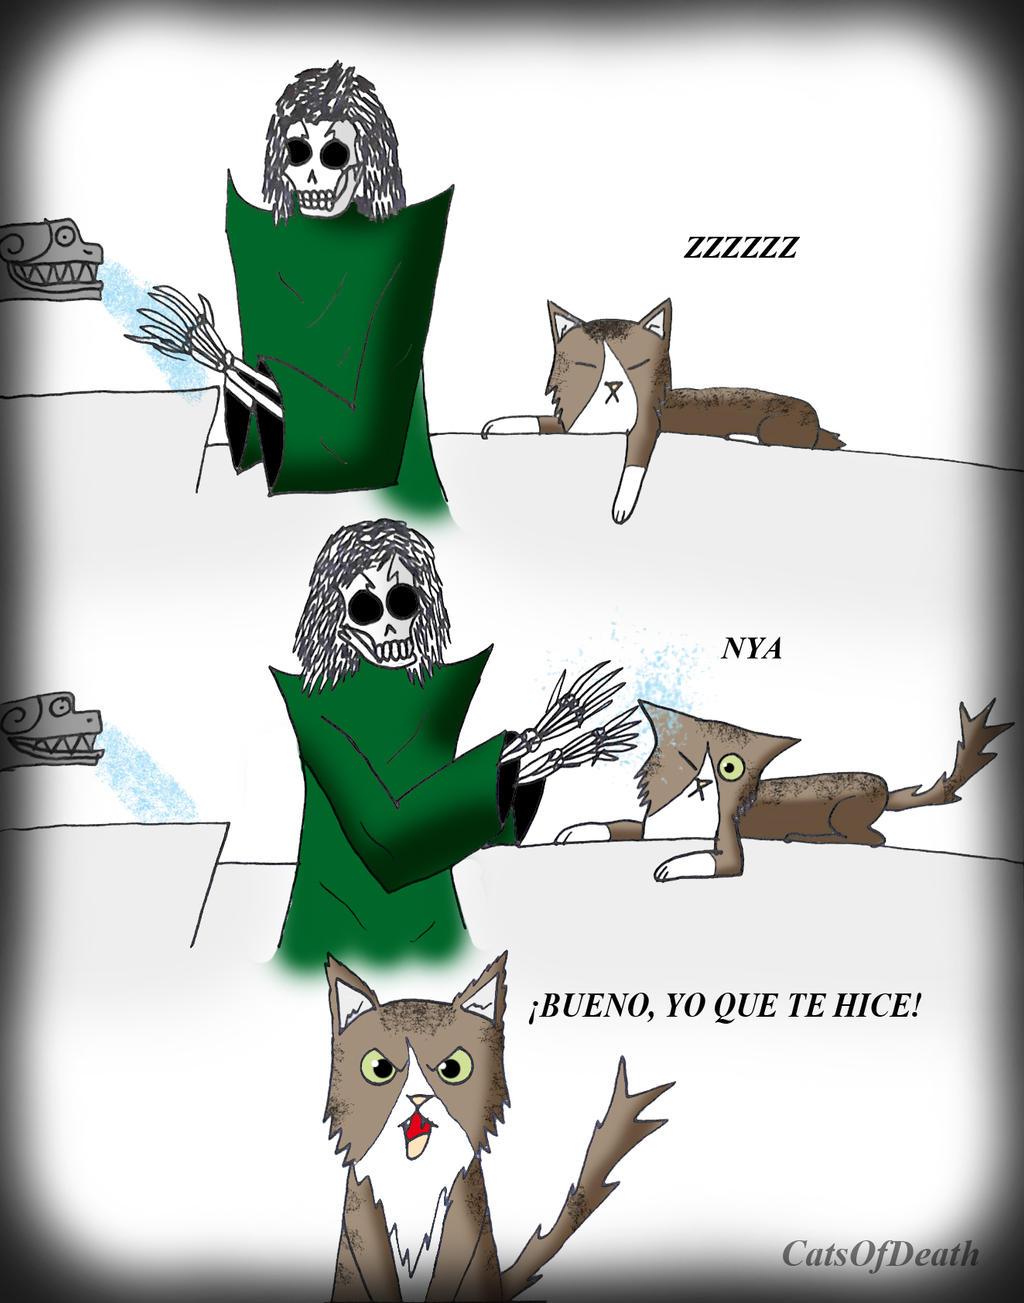 Gato trolleado by Catsofdeath